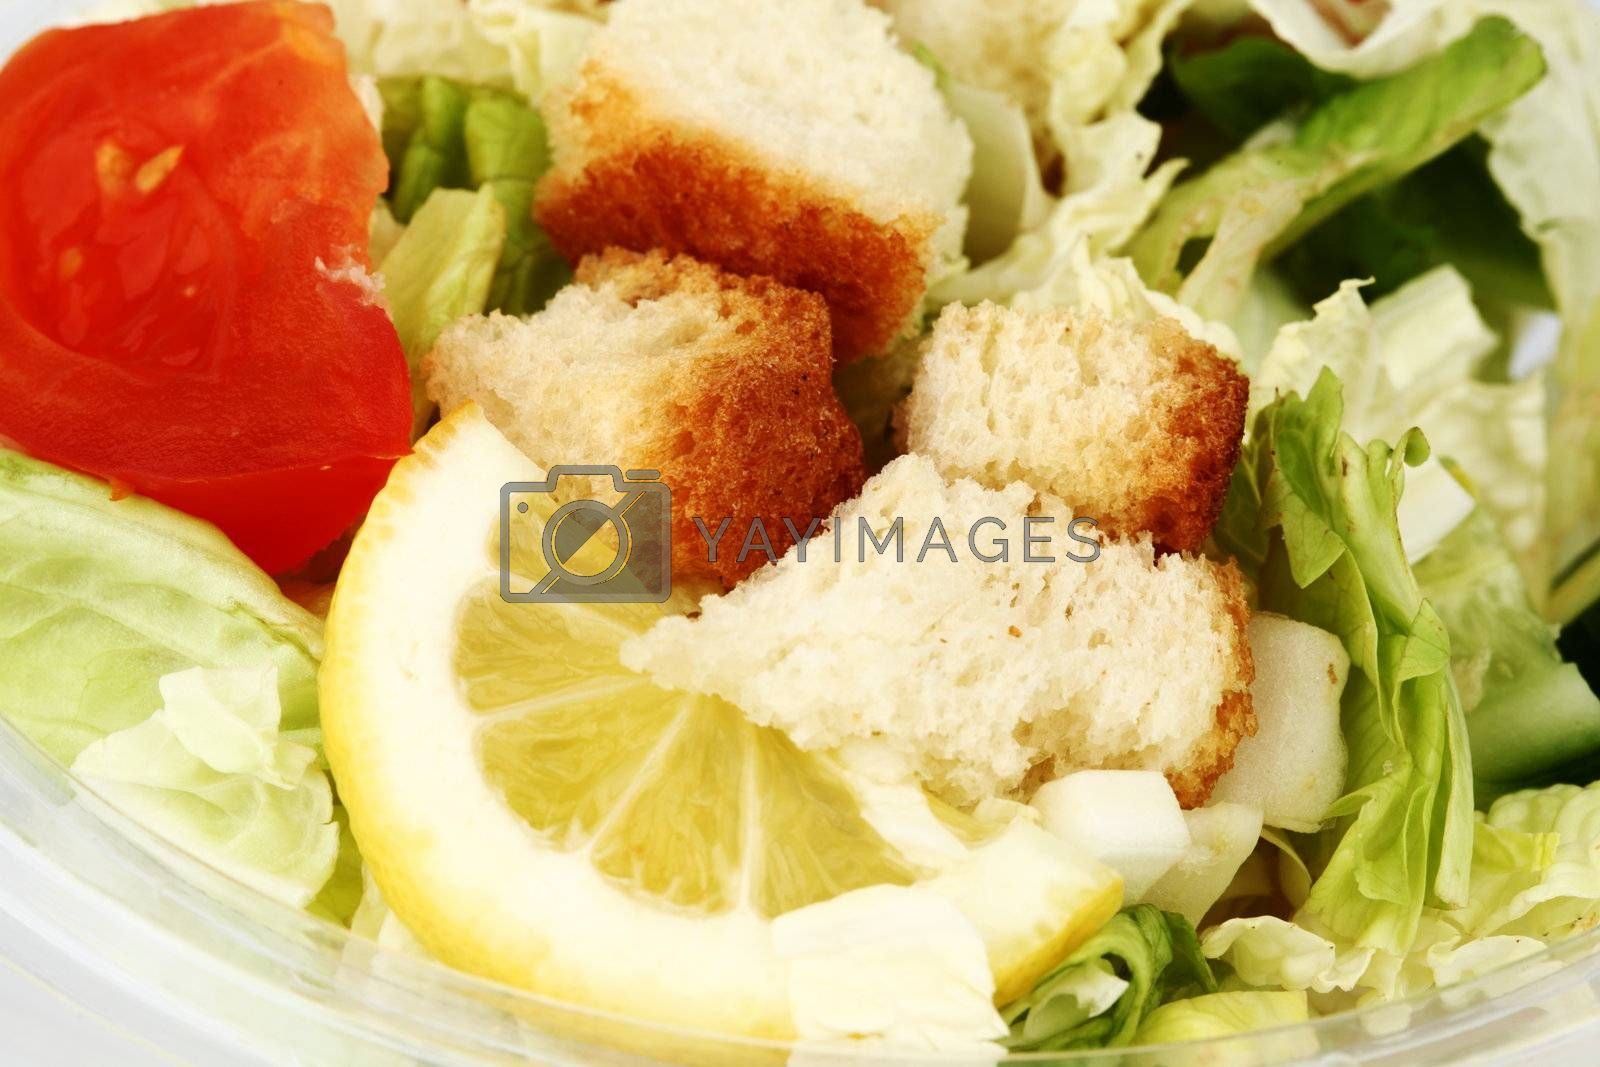 salad close up macro background